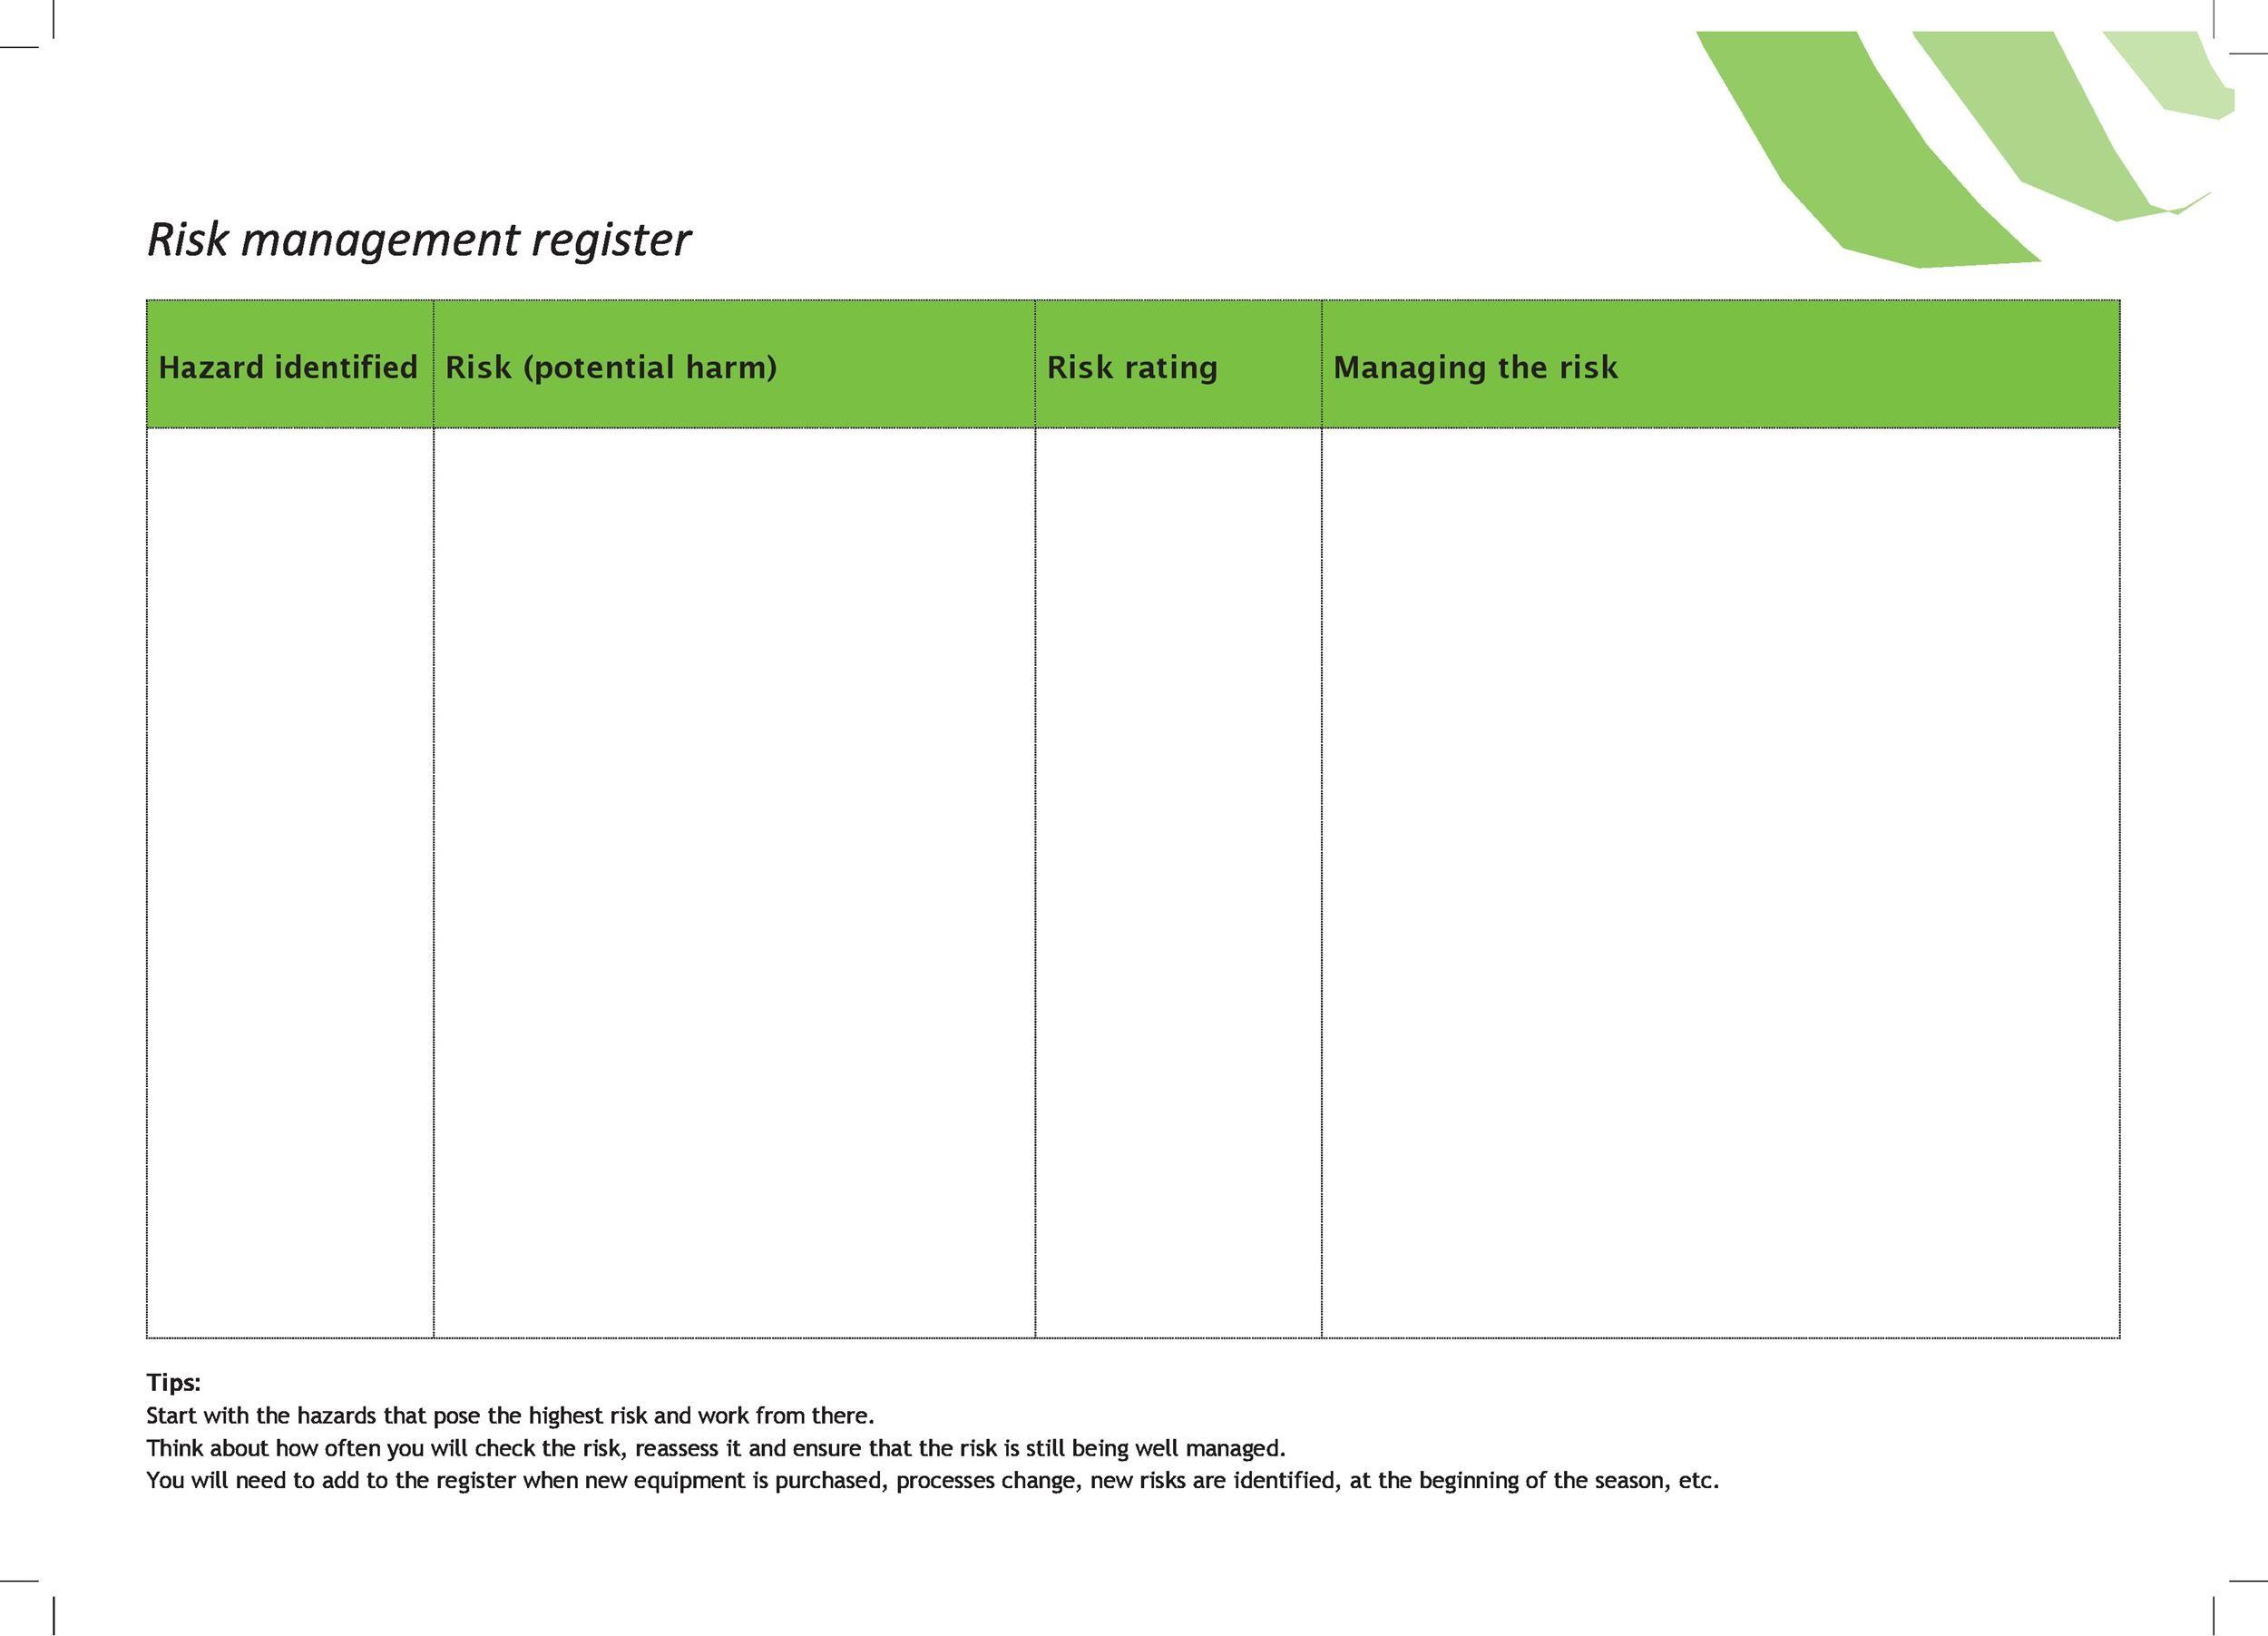 45 Useful Risk Register Templates (Word & Excel) ᐅ TemplateLab